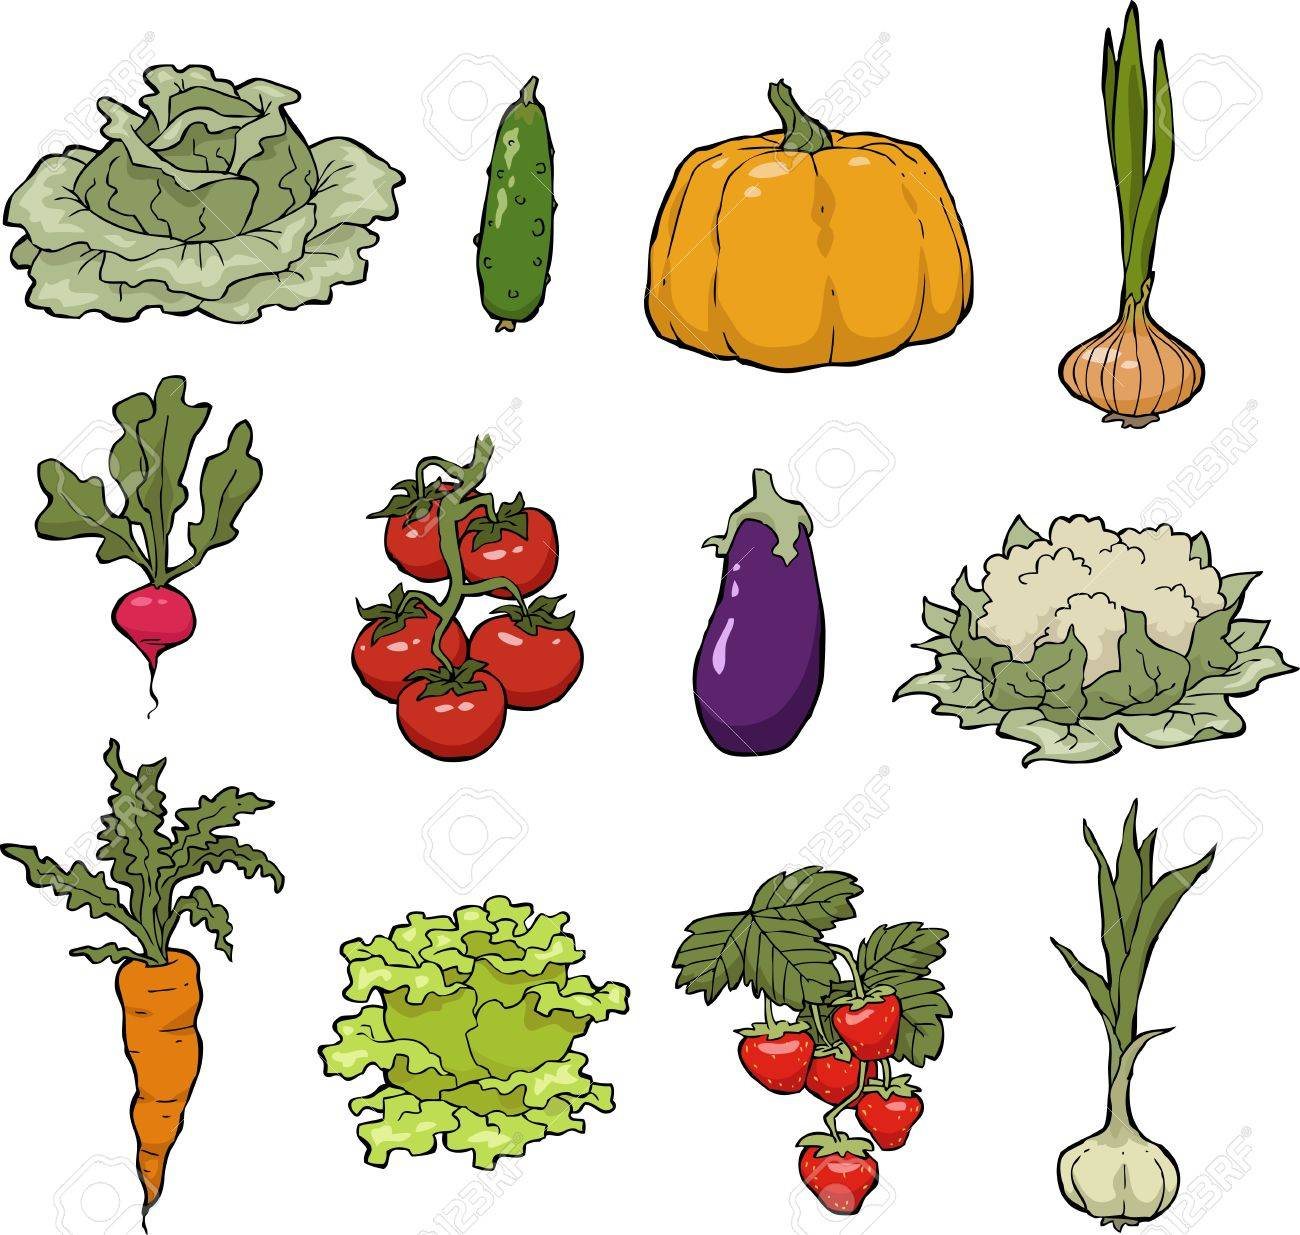 Set of vegetables on a white background vector illustration - 21138281